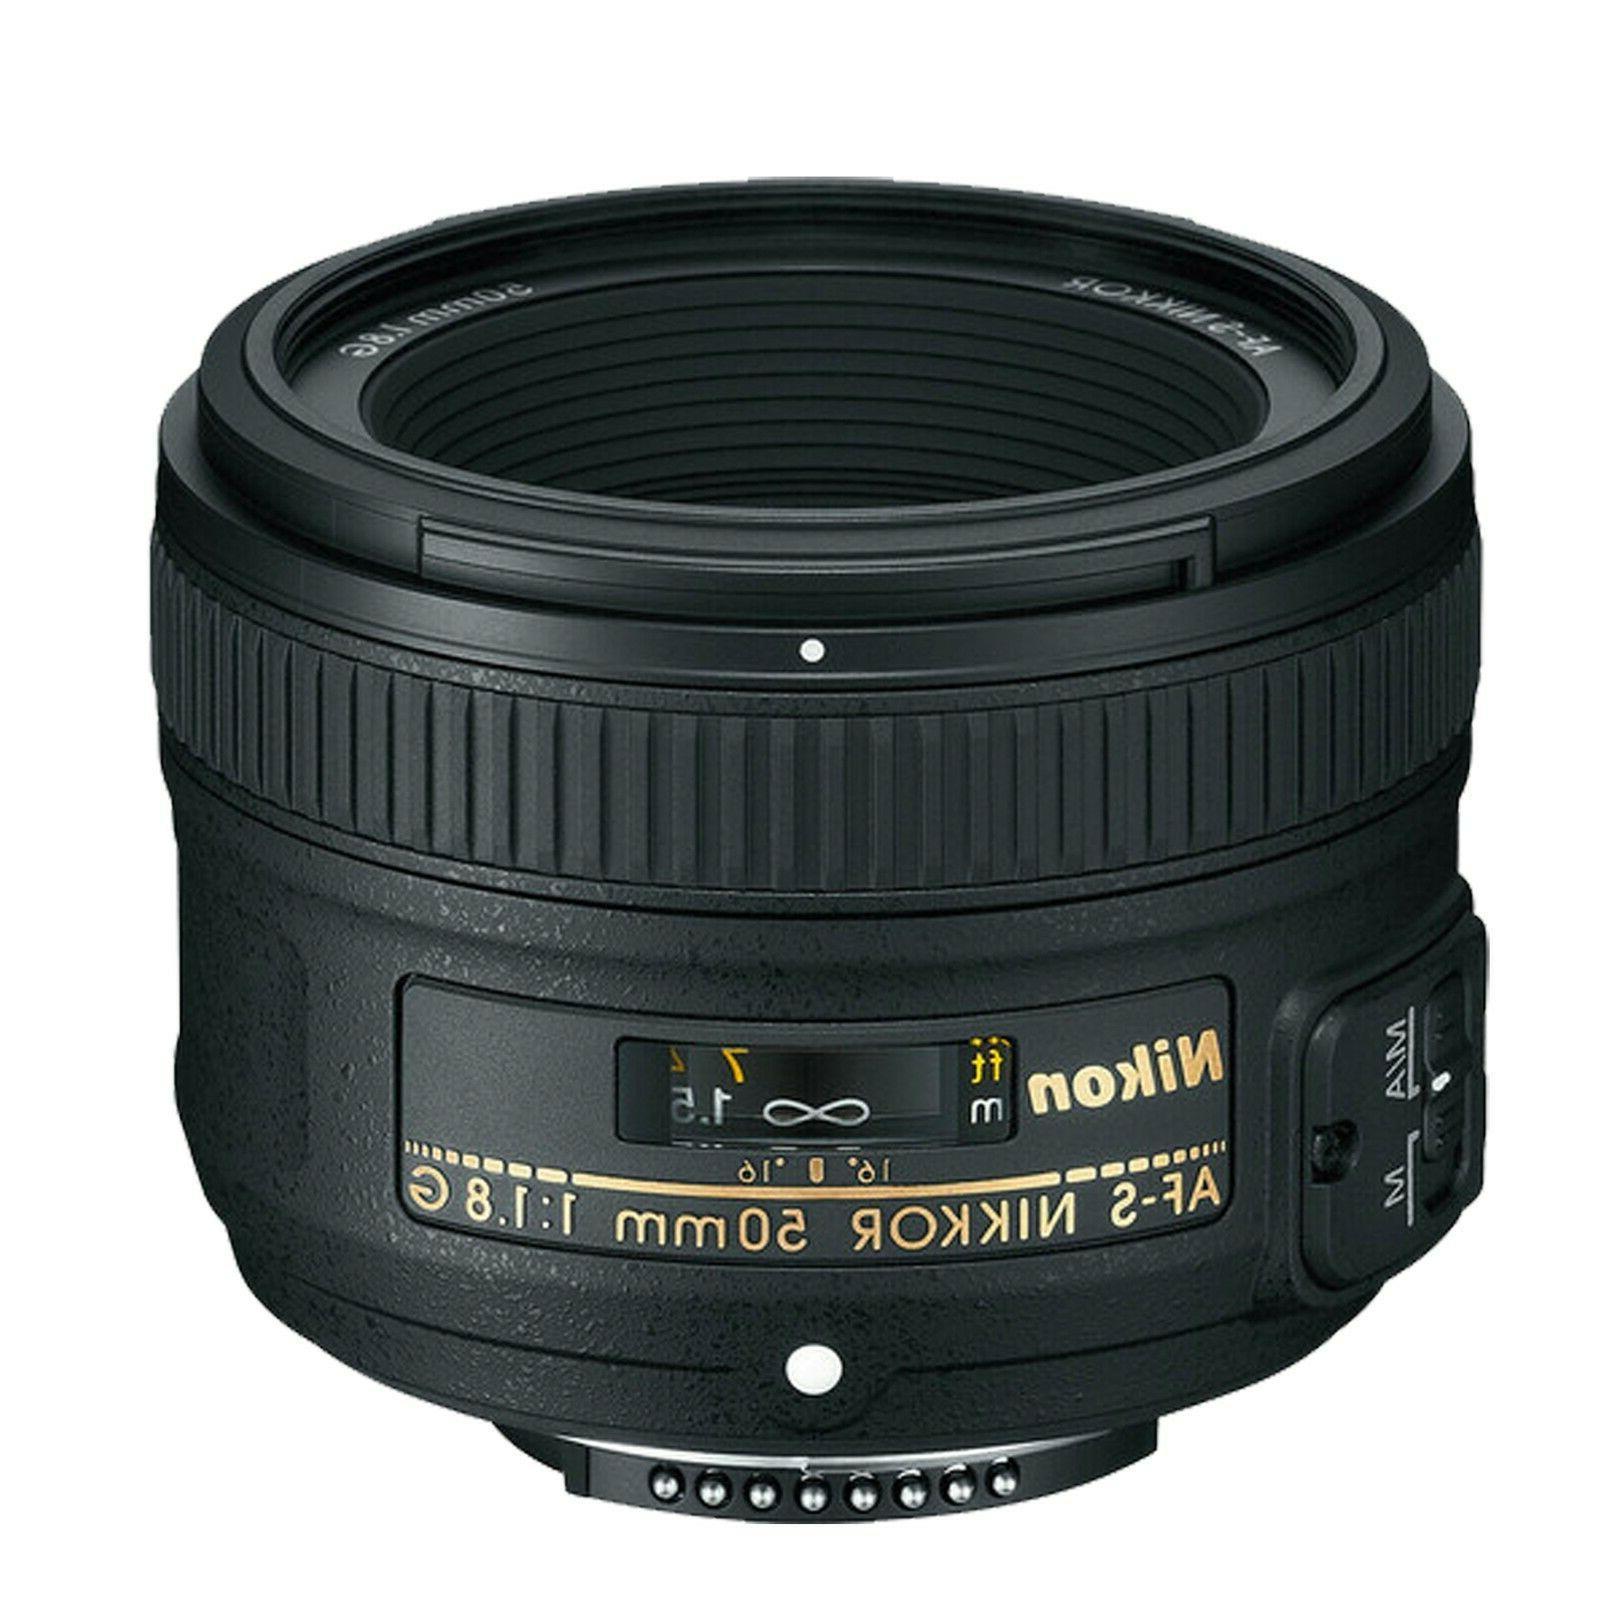 Nikon 50mm NIKKOR Digital SLR Cameras